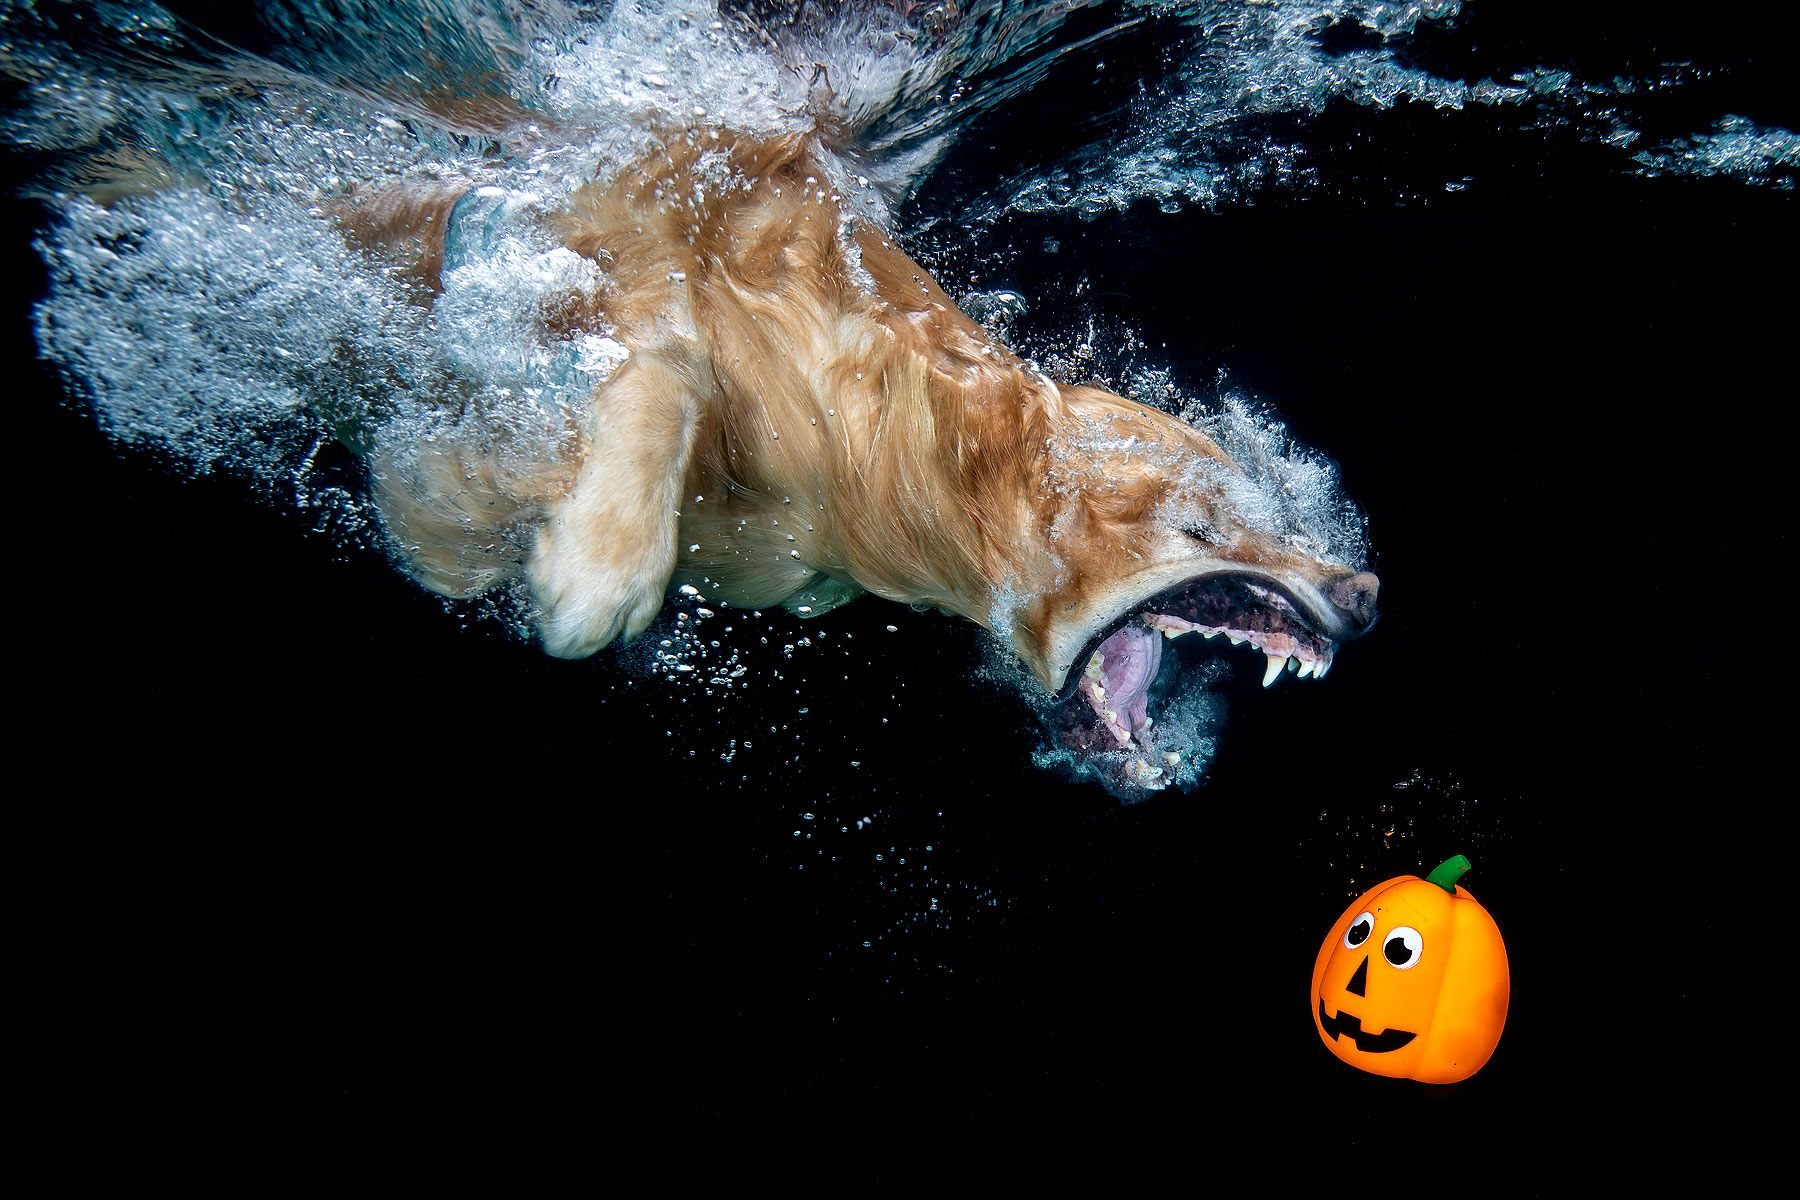 Ozzy-diving-after-orange-pumpkin_83A8586-Dover,-FL,-USA.jpg